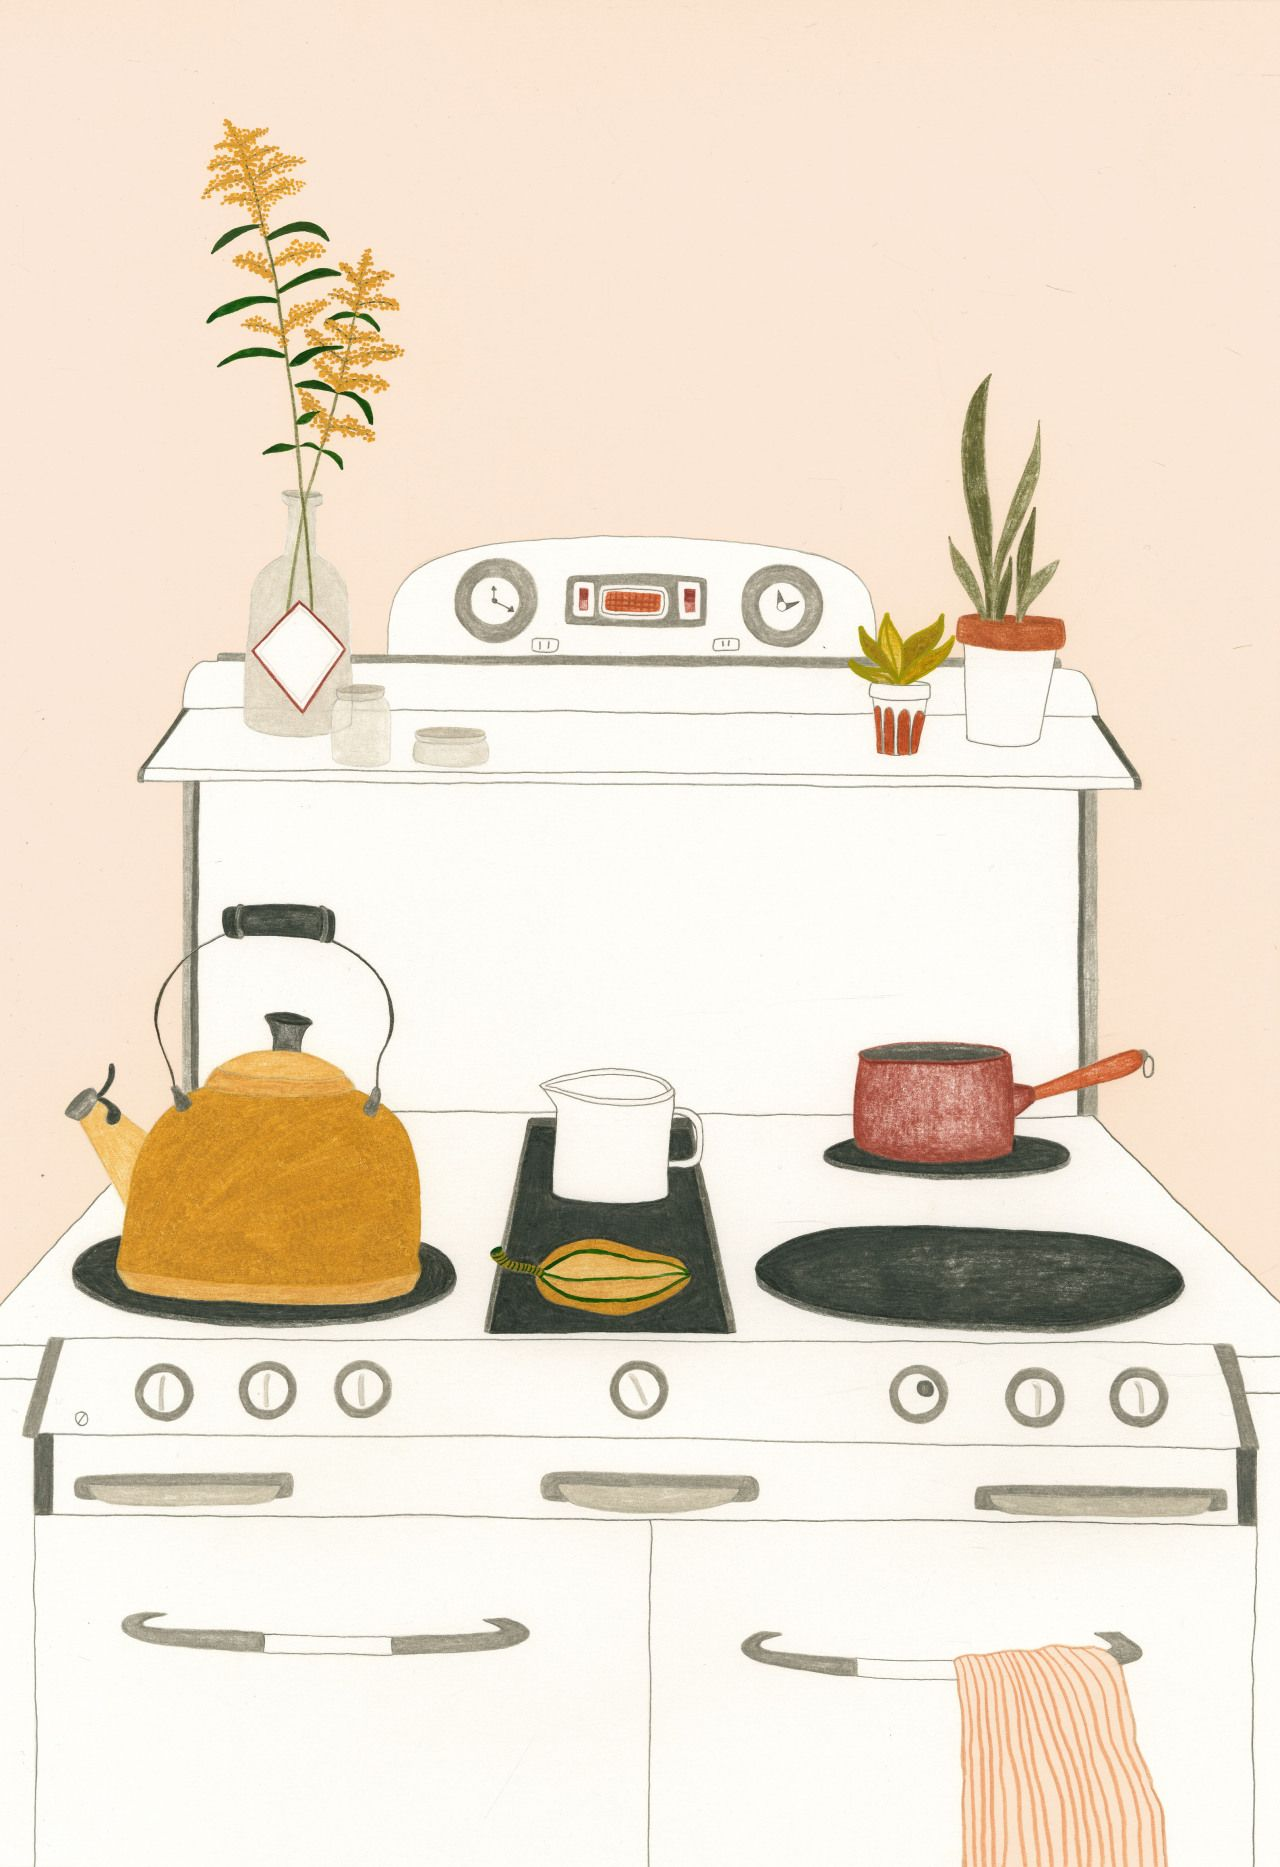 Kitchen cute illustration croquis kitchen drawing pastel kitchen pretty art